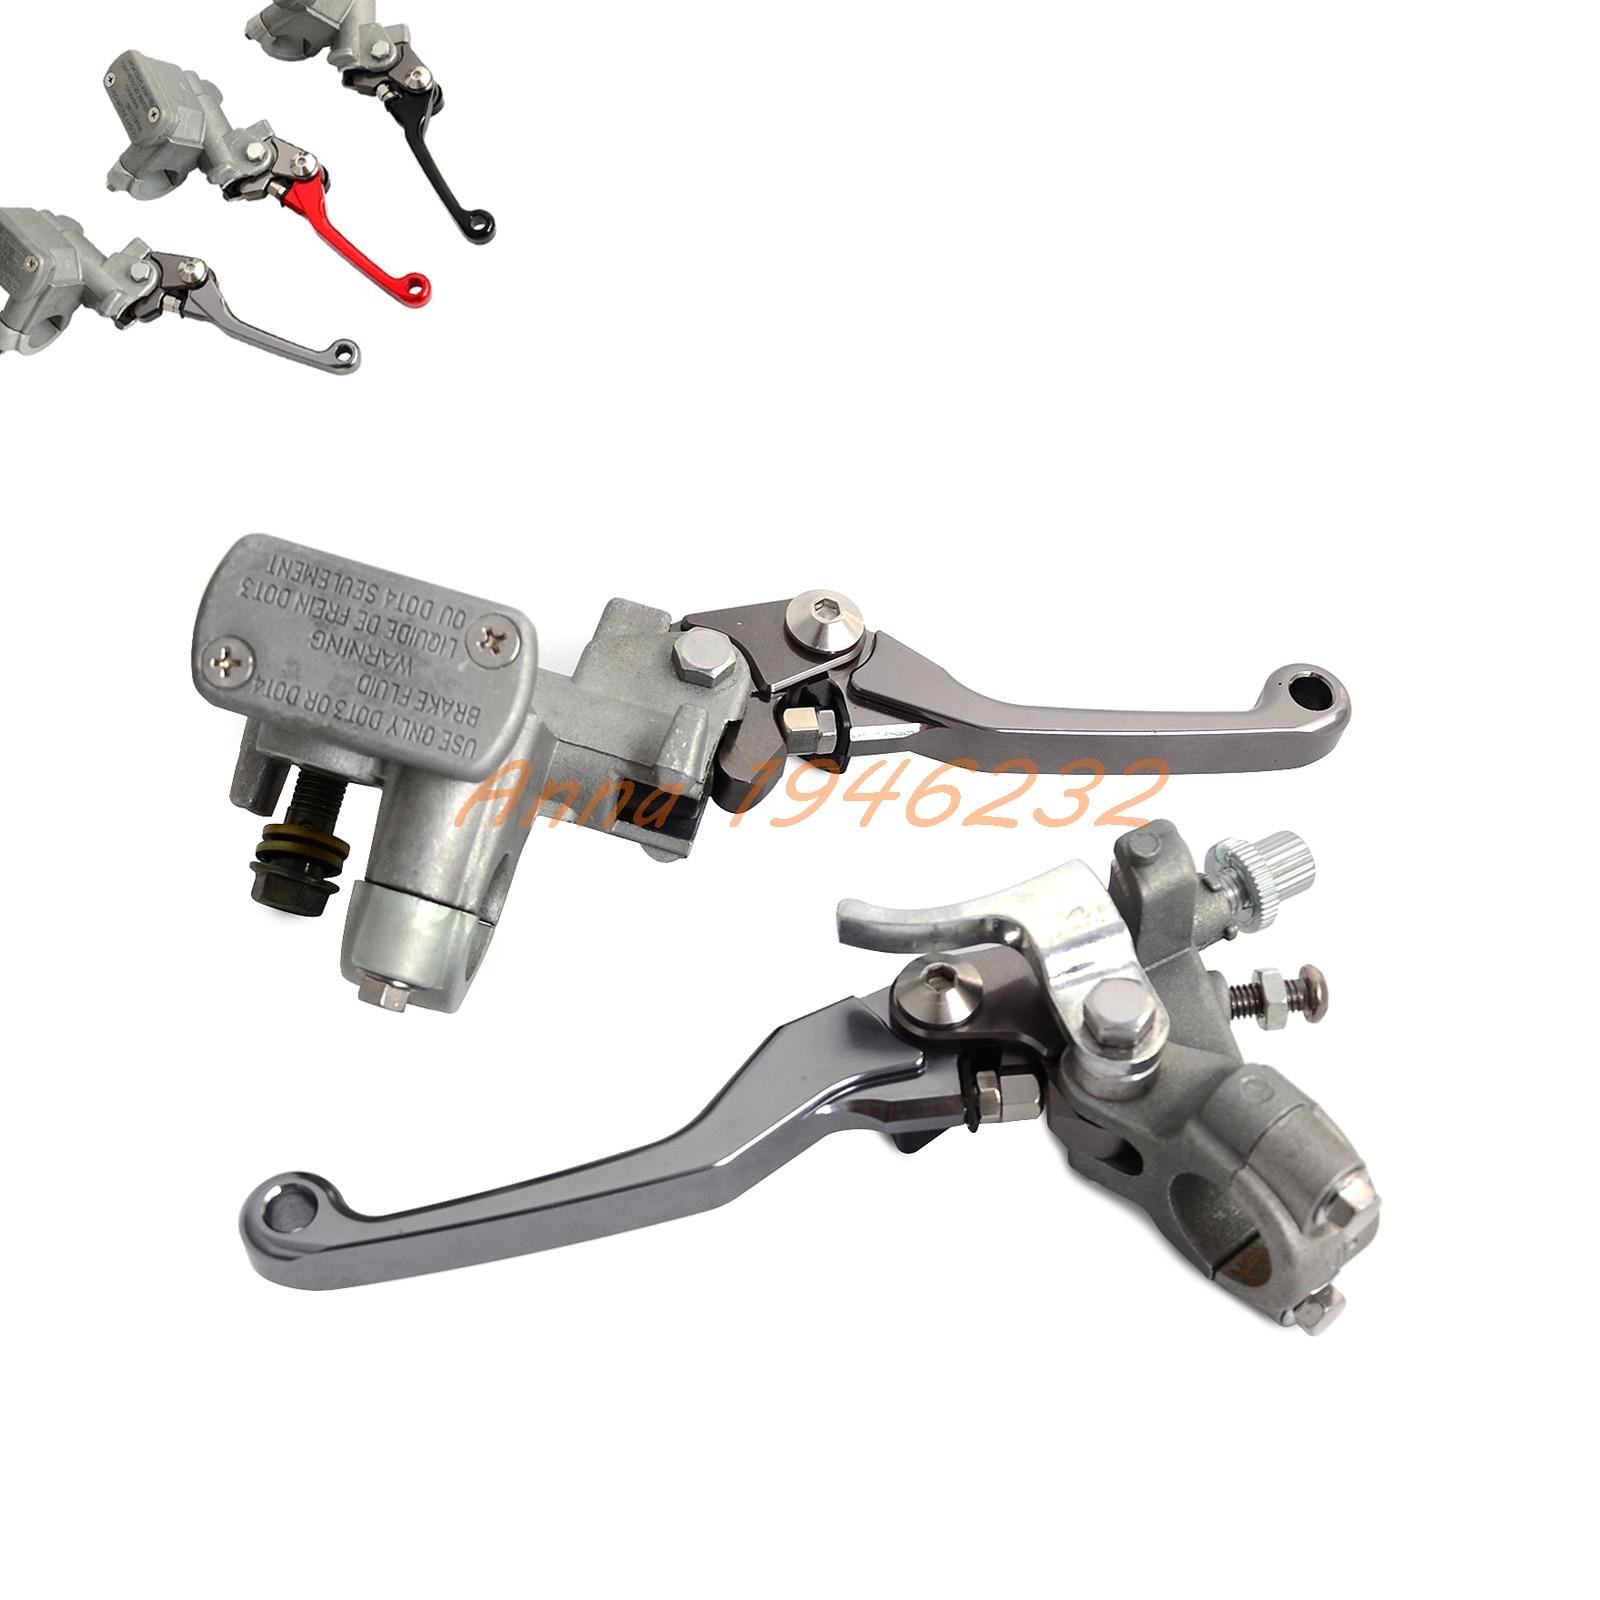 Тормозной главный цилиндр сцепления рычаг для Honda CR125R CR250R CRF250R 1996-2007/х 2004-2016 CRF450R 2002-2006 CR500R CRF150R